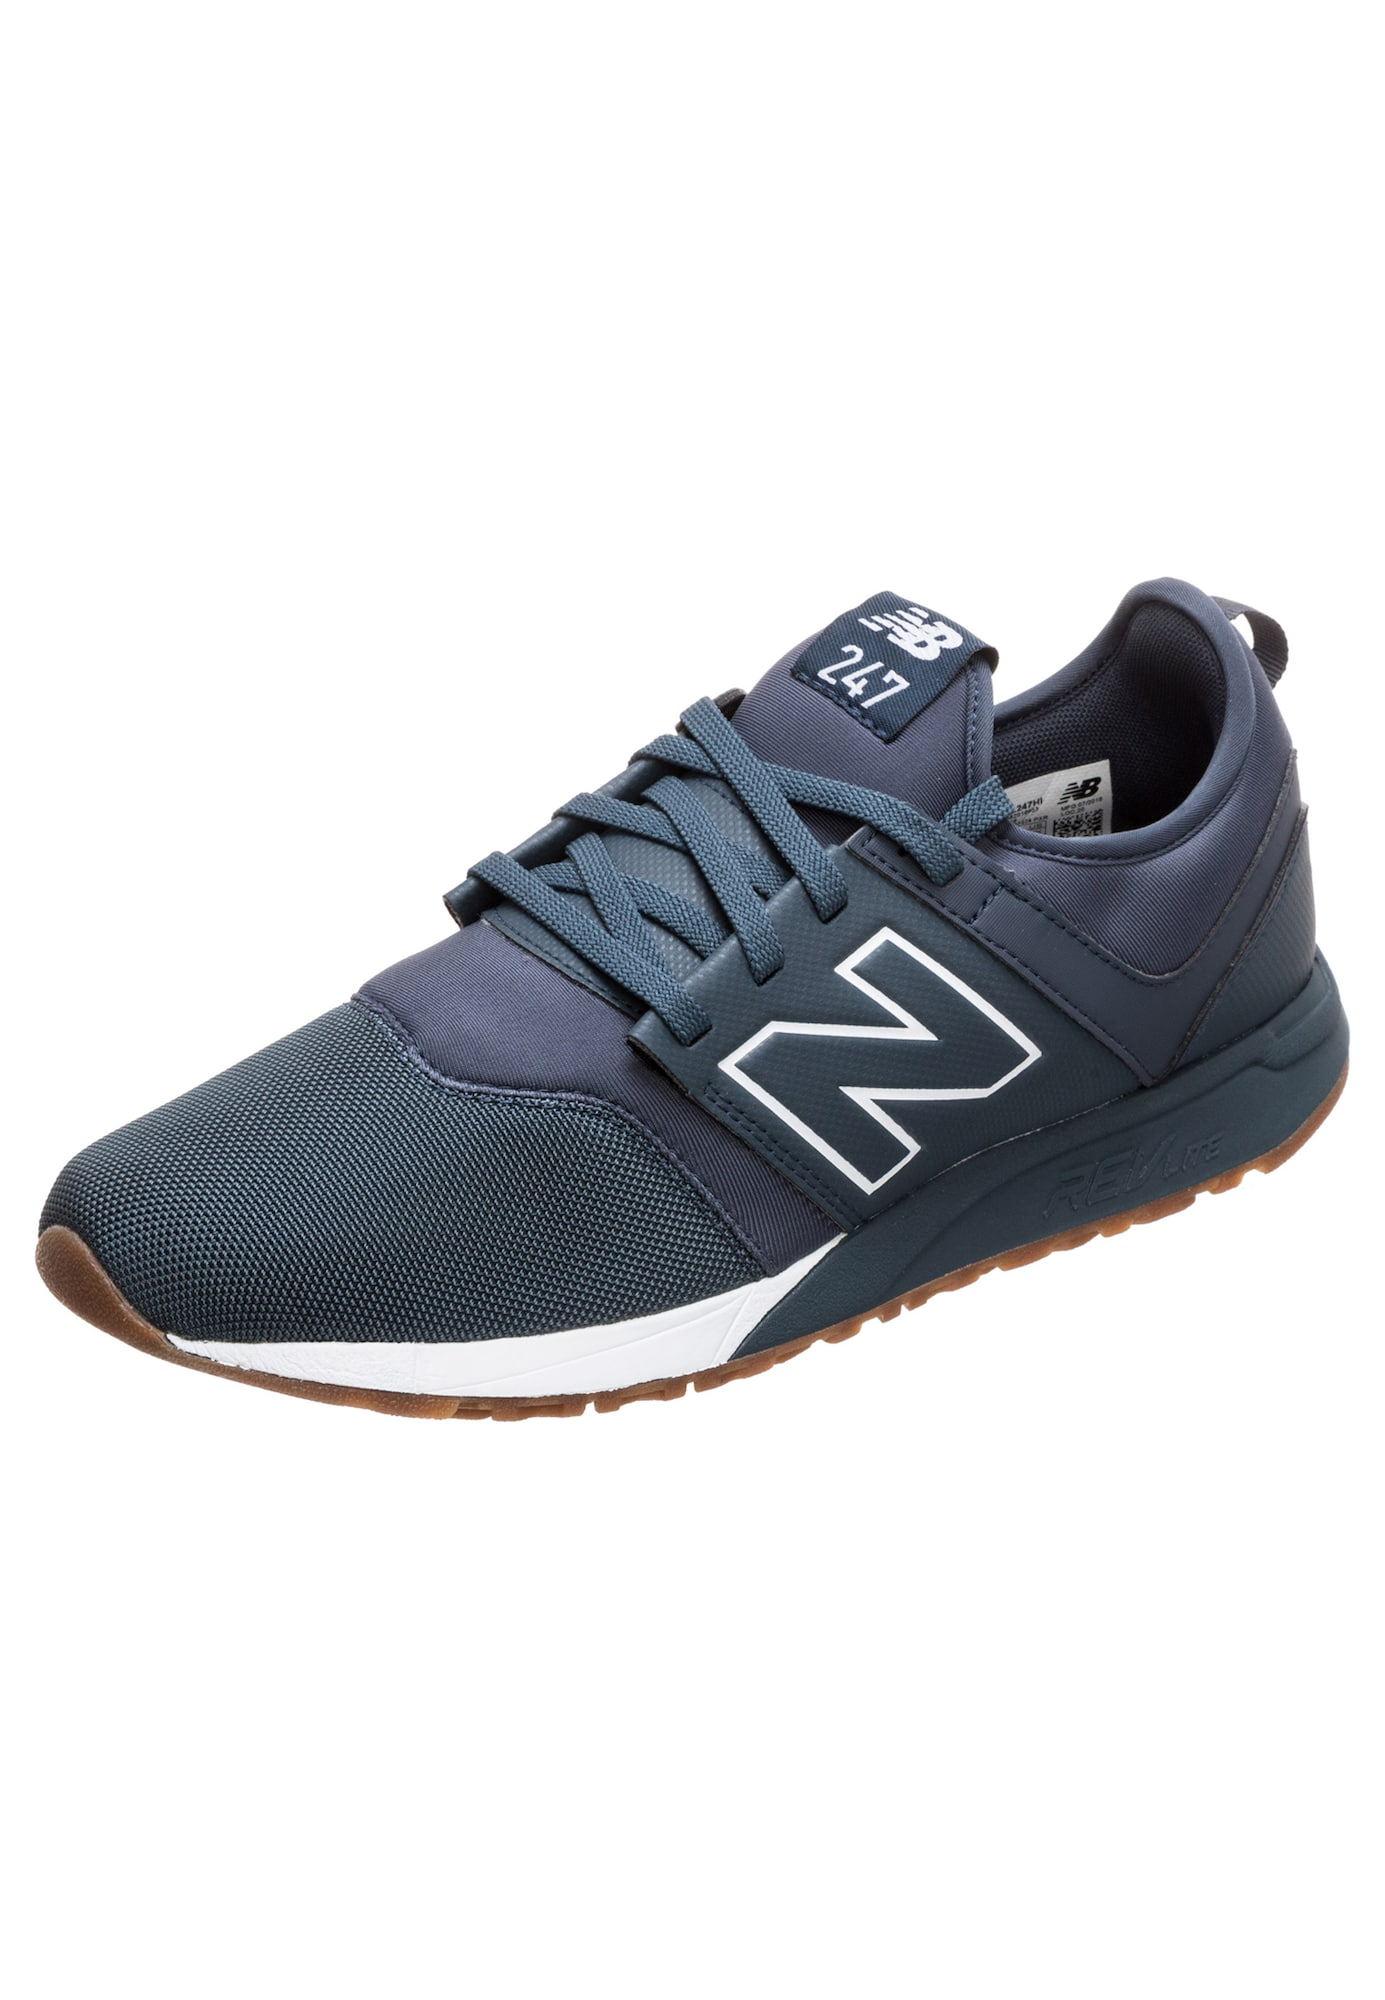 New Balance, Heren Sneakers laag 'MRL247-HI-D', nachtblauw